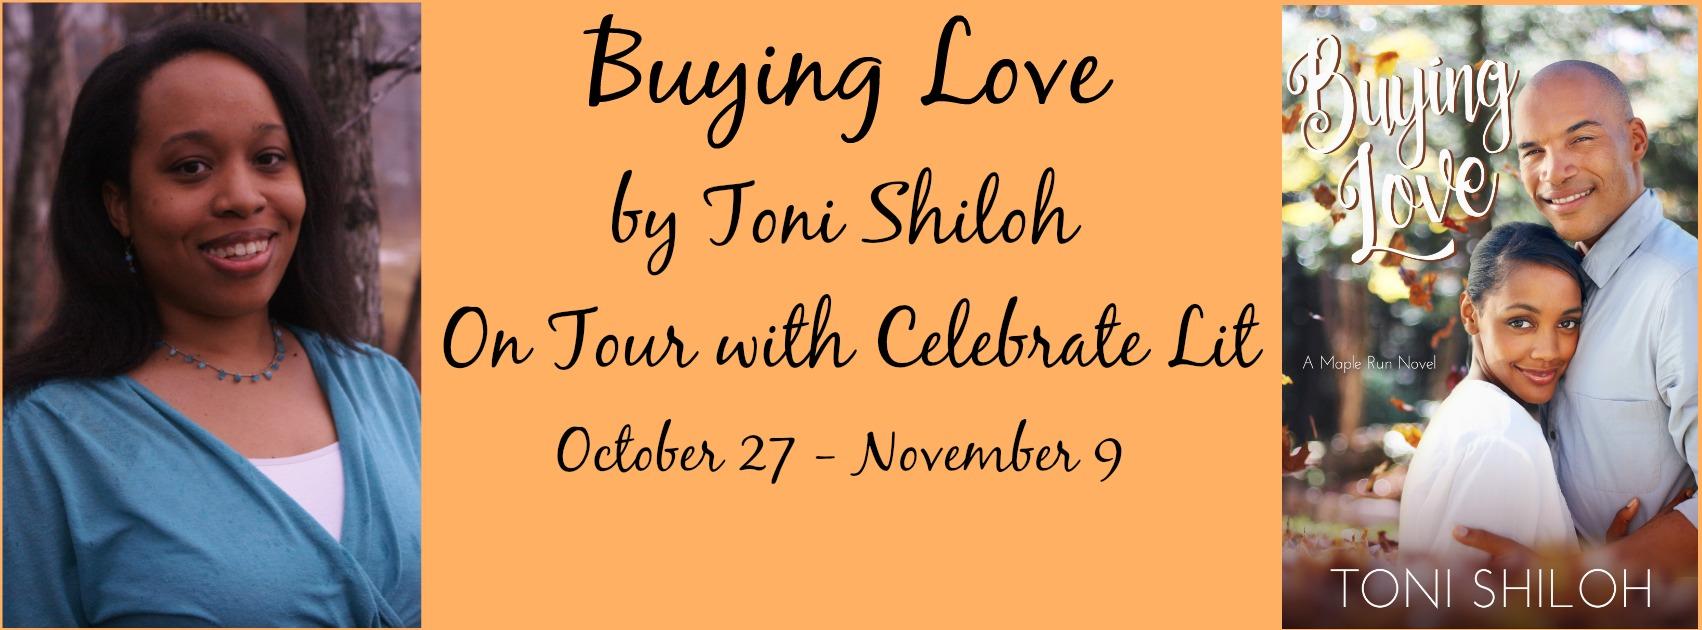 Buying-Love-Banner.jpg